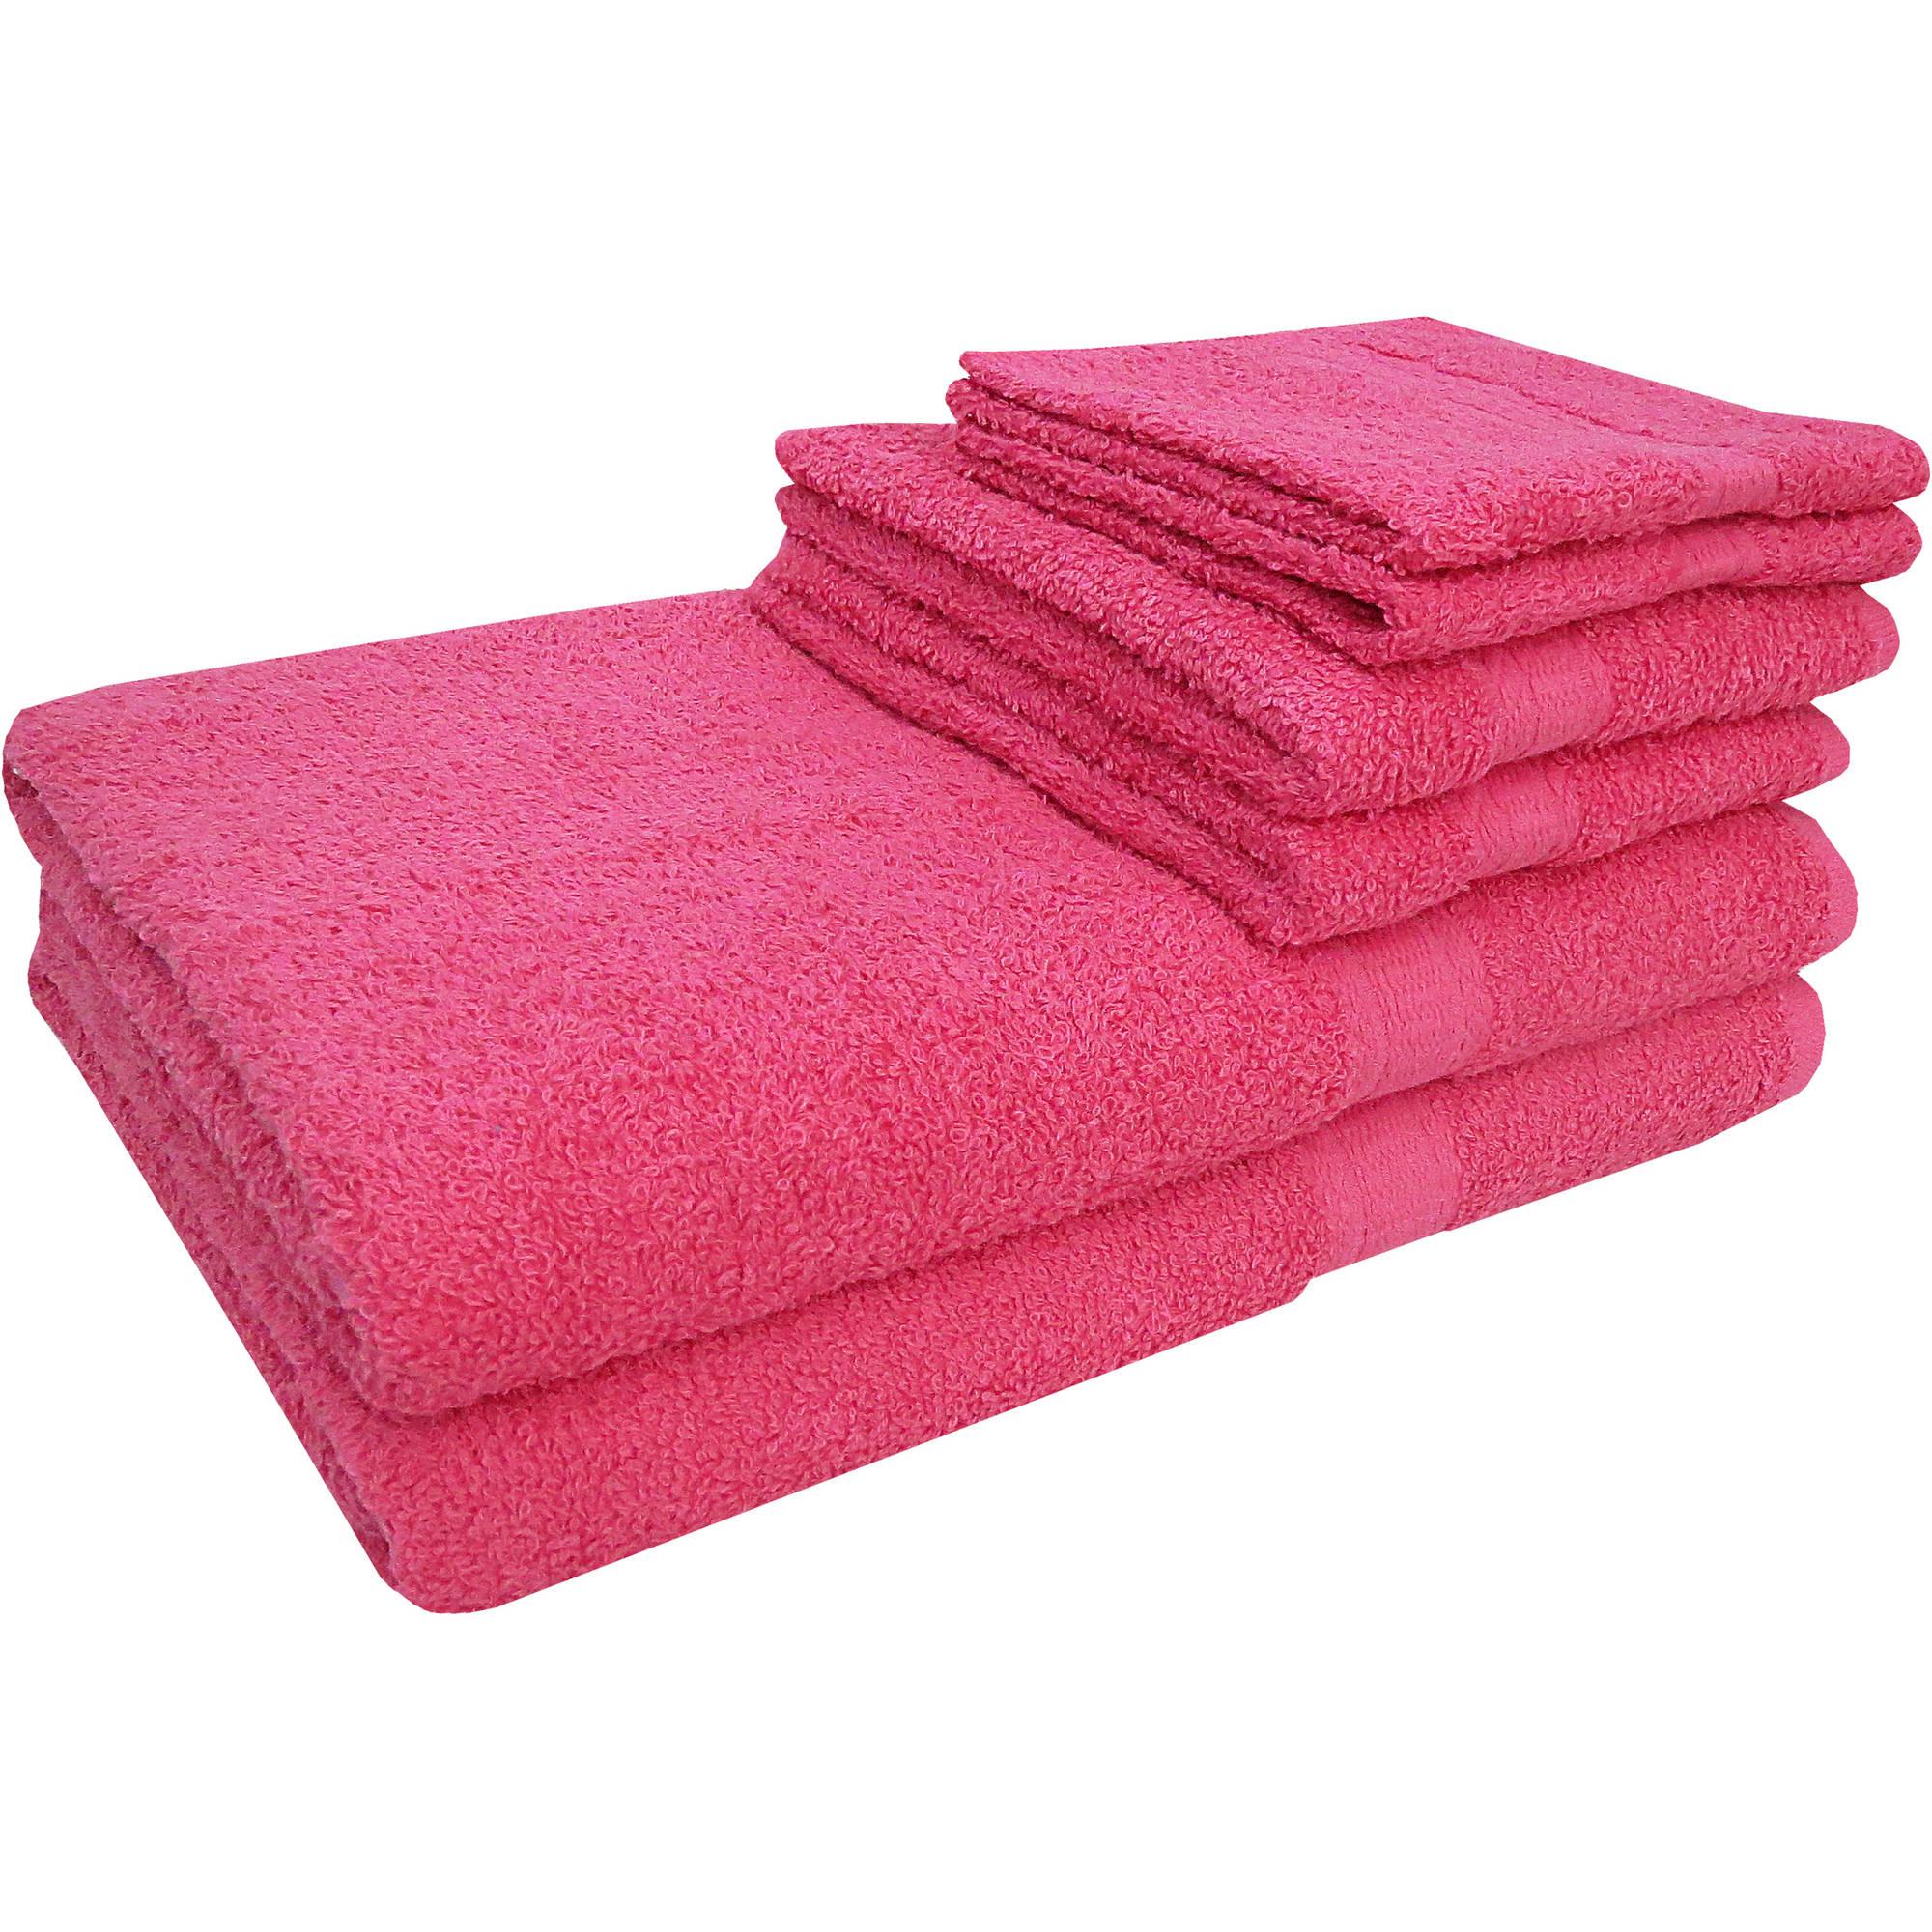 Mainstays Basic 6-Piece Towel Set by 1888 Mills LLC